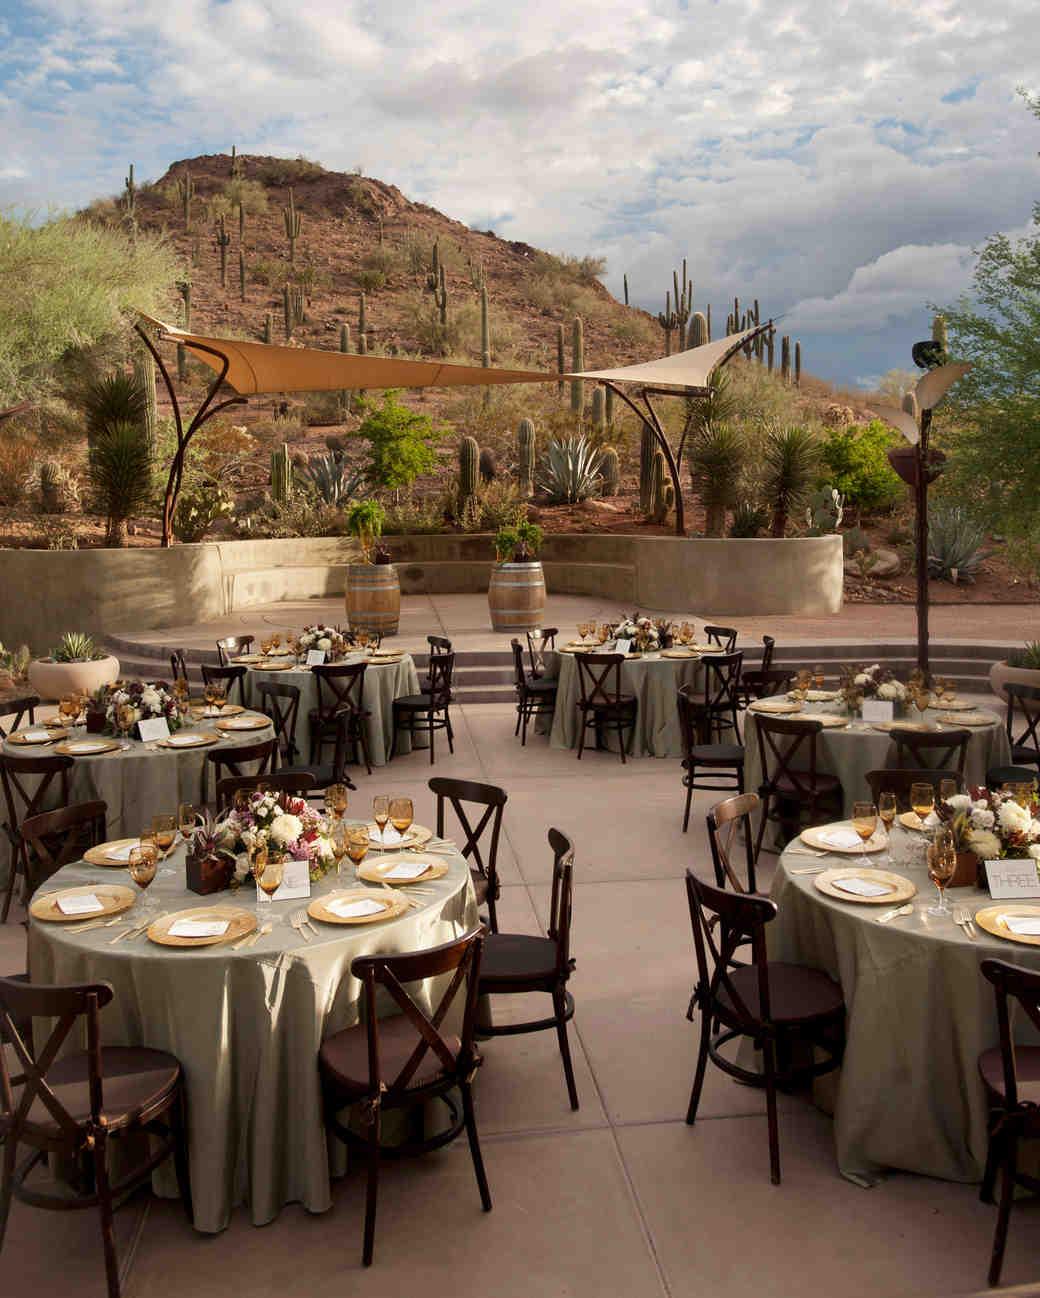 Phoenix Wedding Venues: 18 Beautiful Botanical Garden Wedding Venues